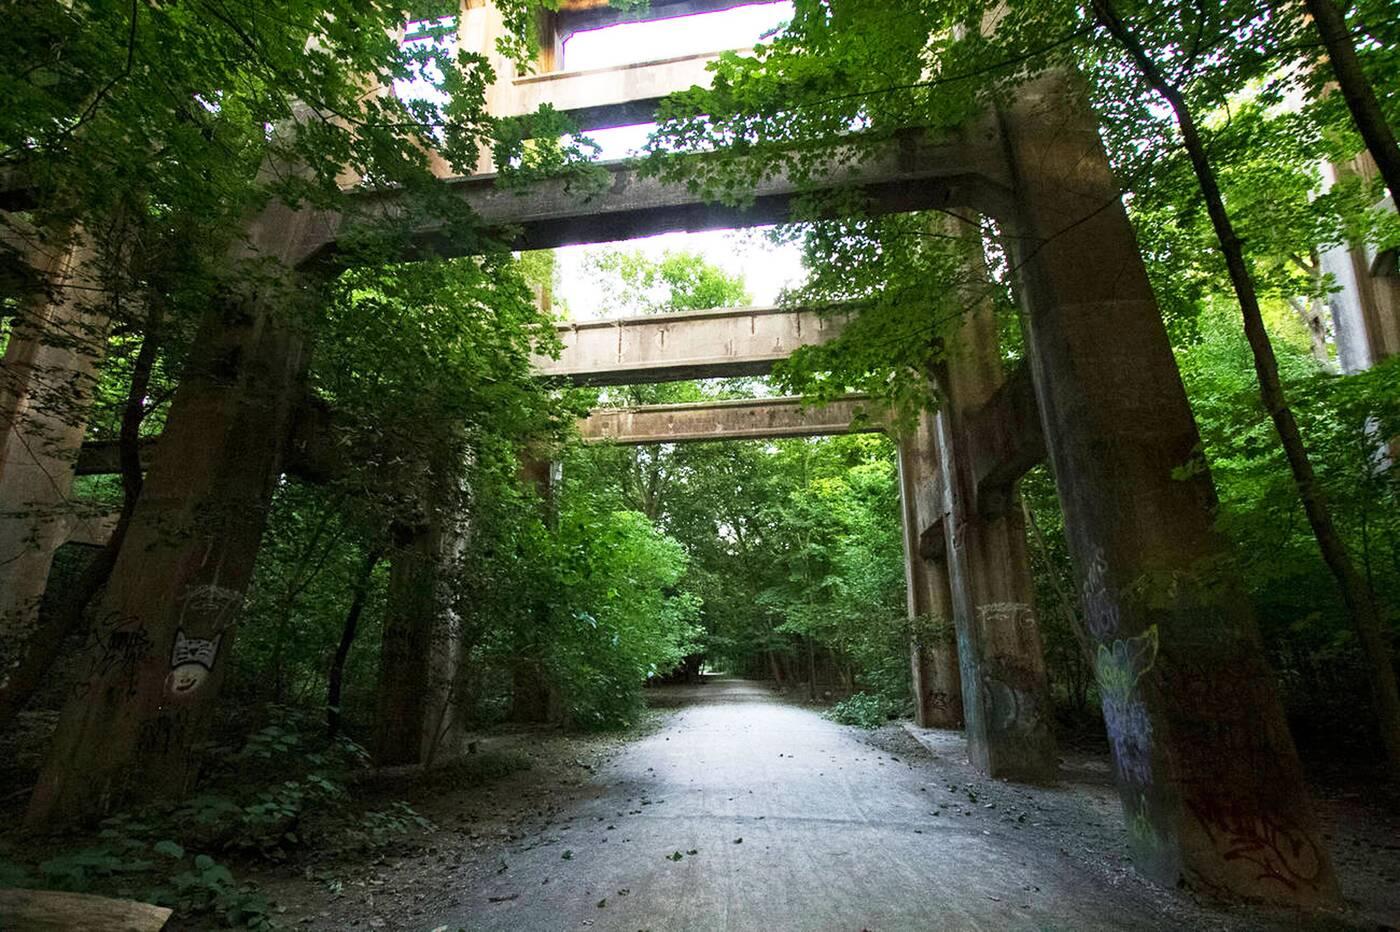 moore park ravine toronto